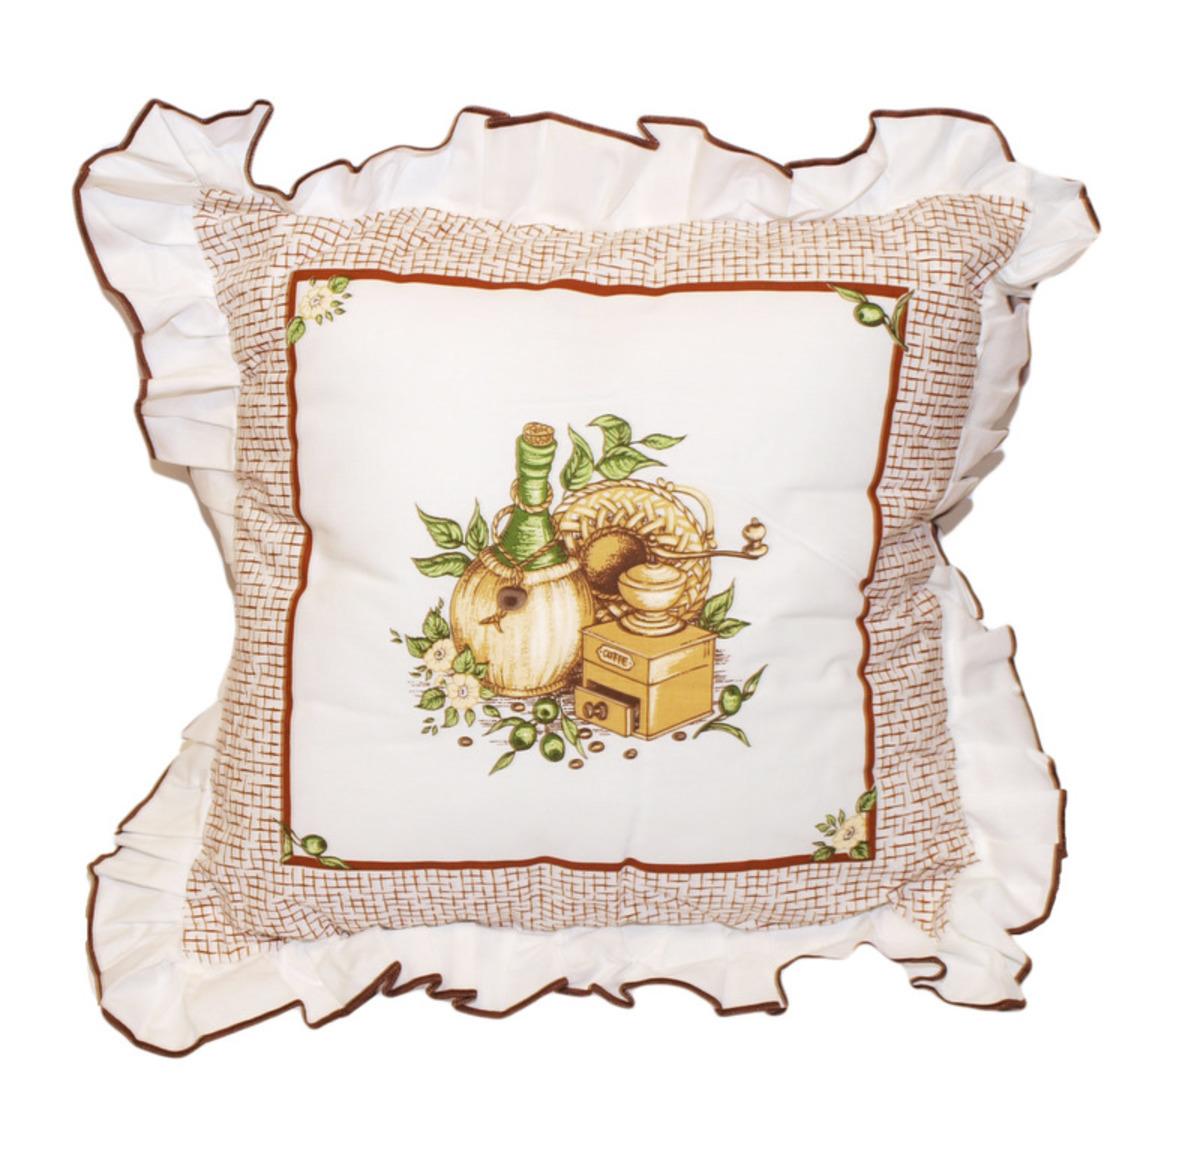 Forbyt Polštář Medi, (návlek a polštář), 40 x 40 cm